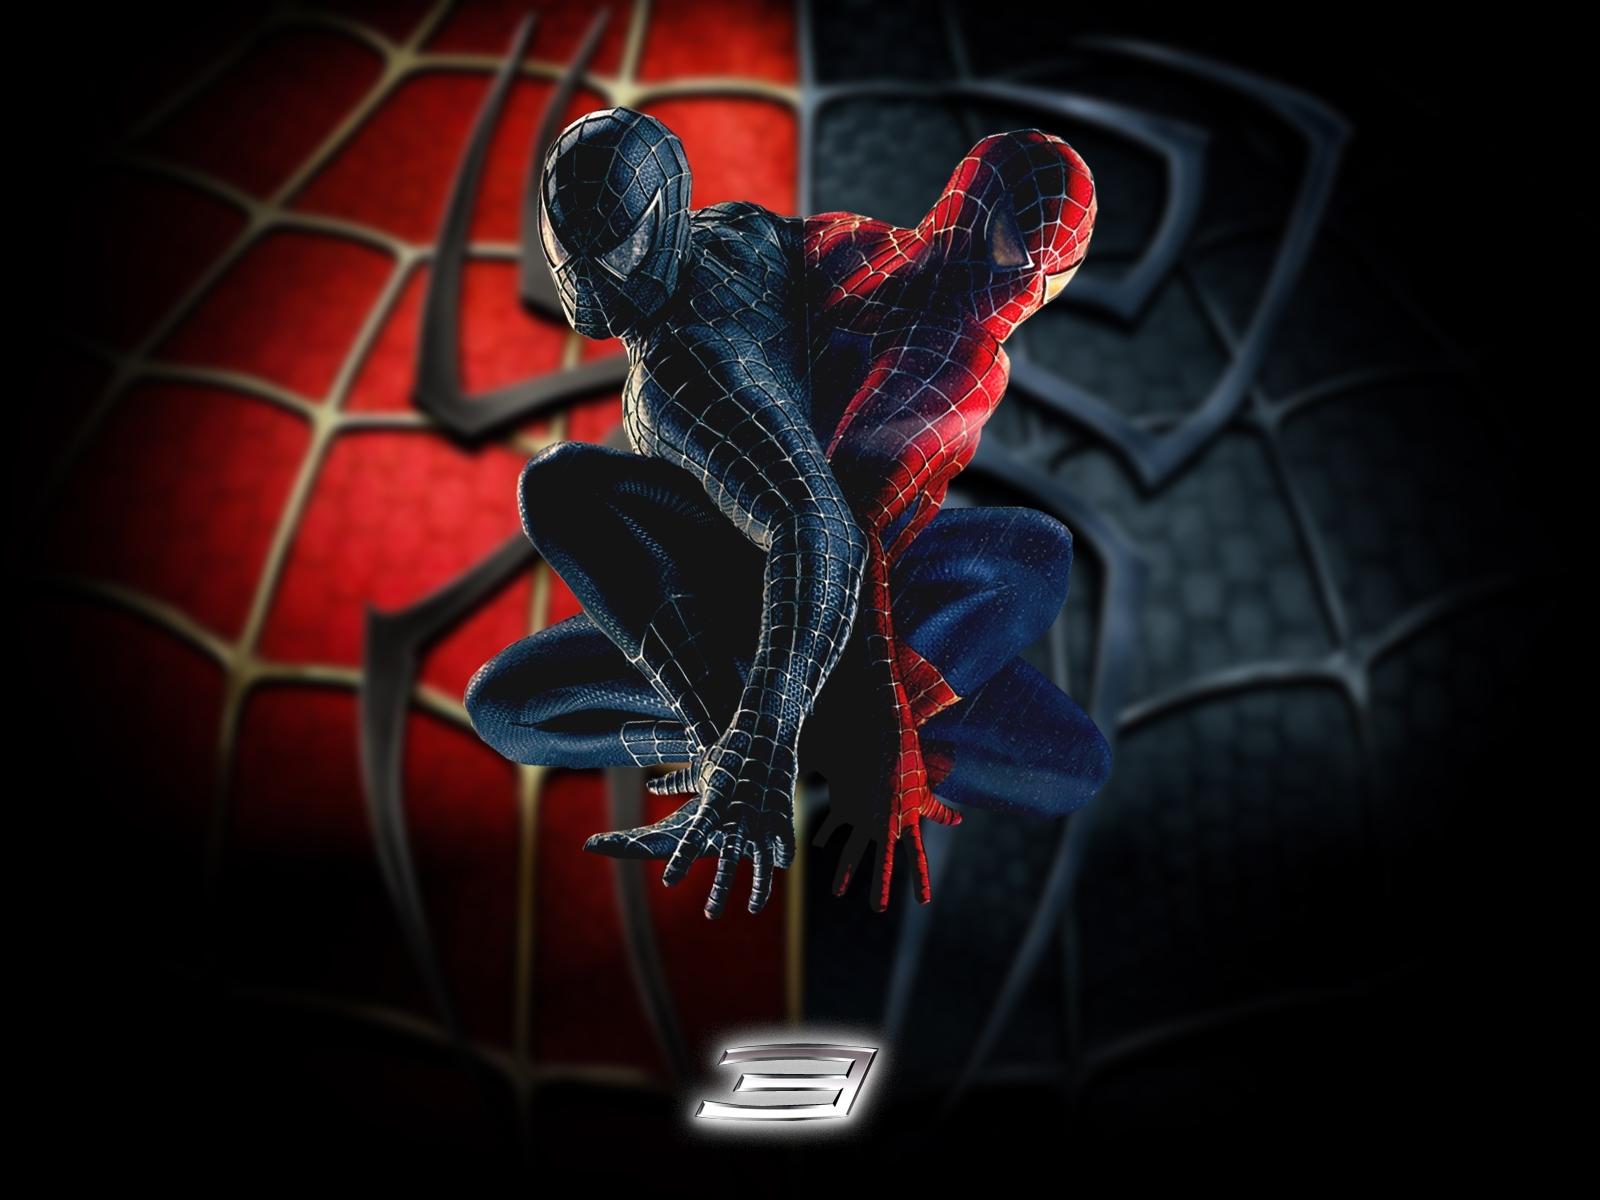 the black spiderman - google search | superheros/villains